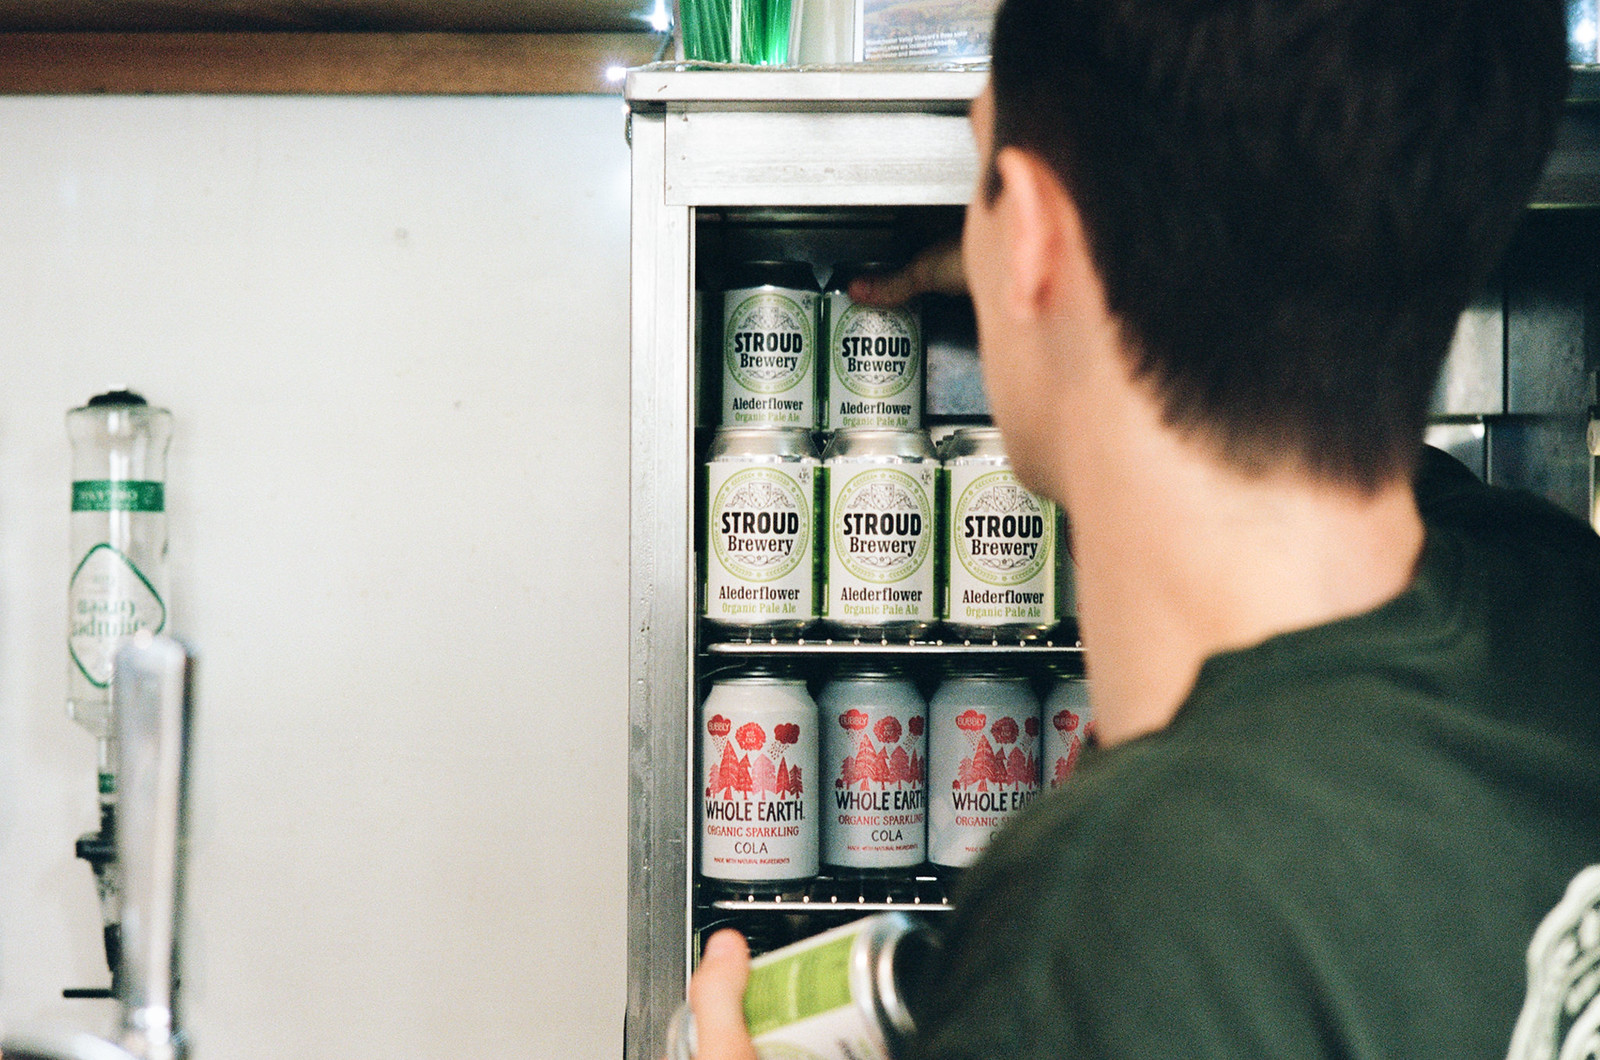 Stroud-brewery-6